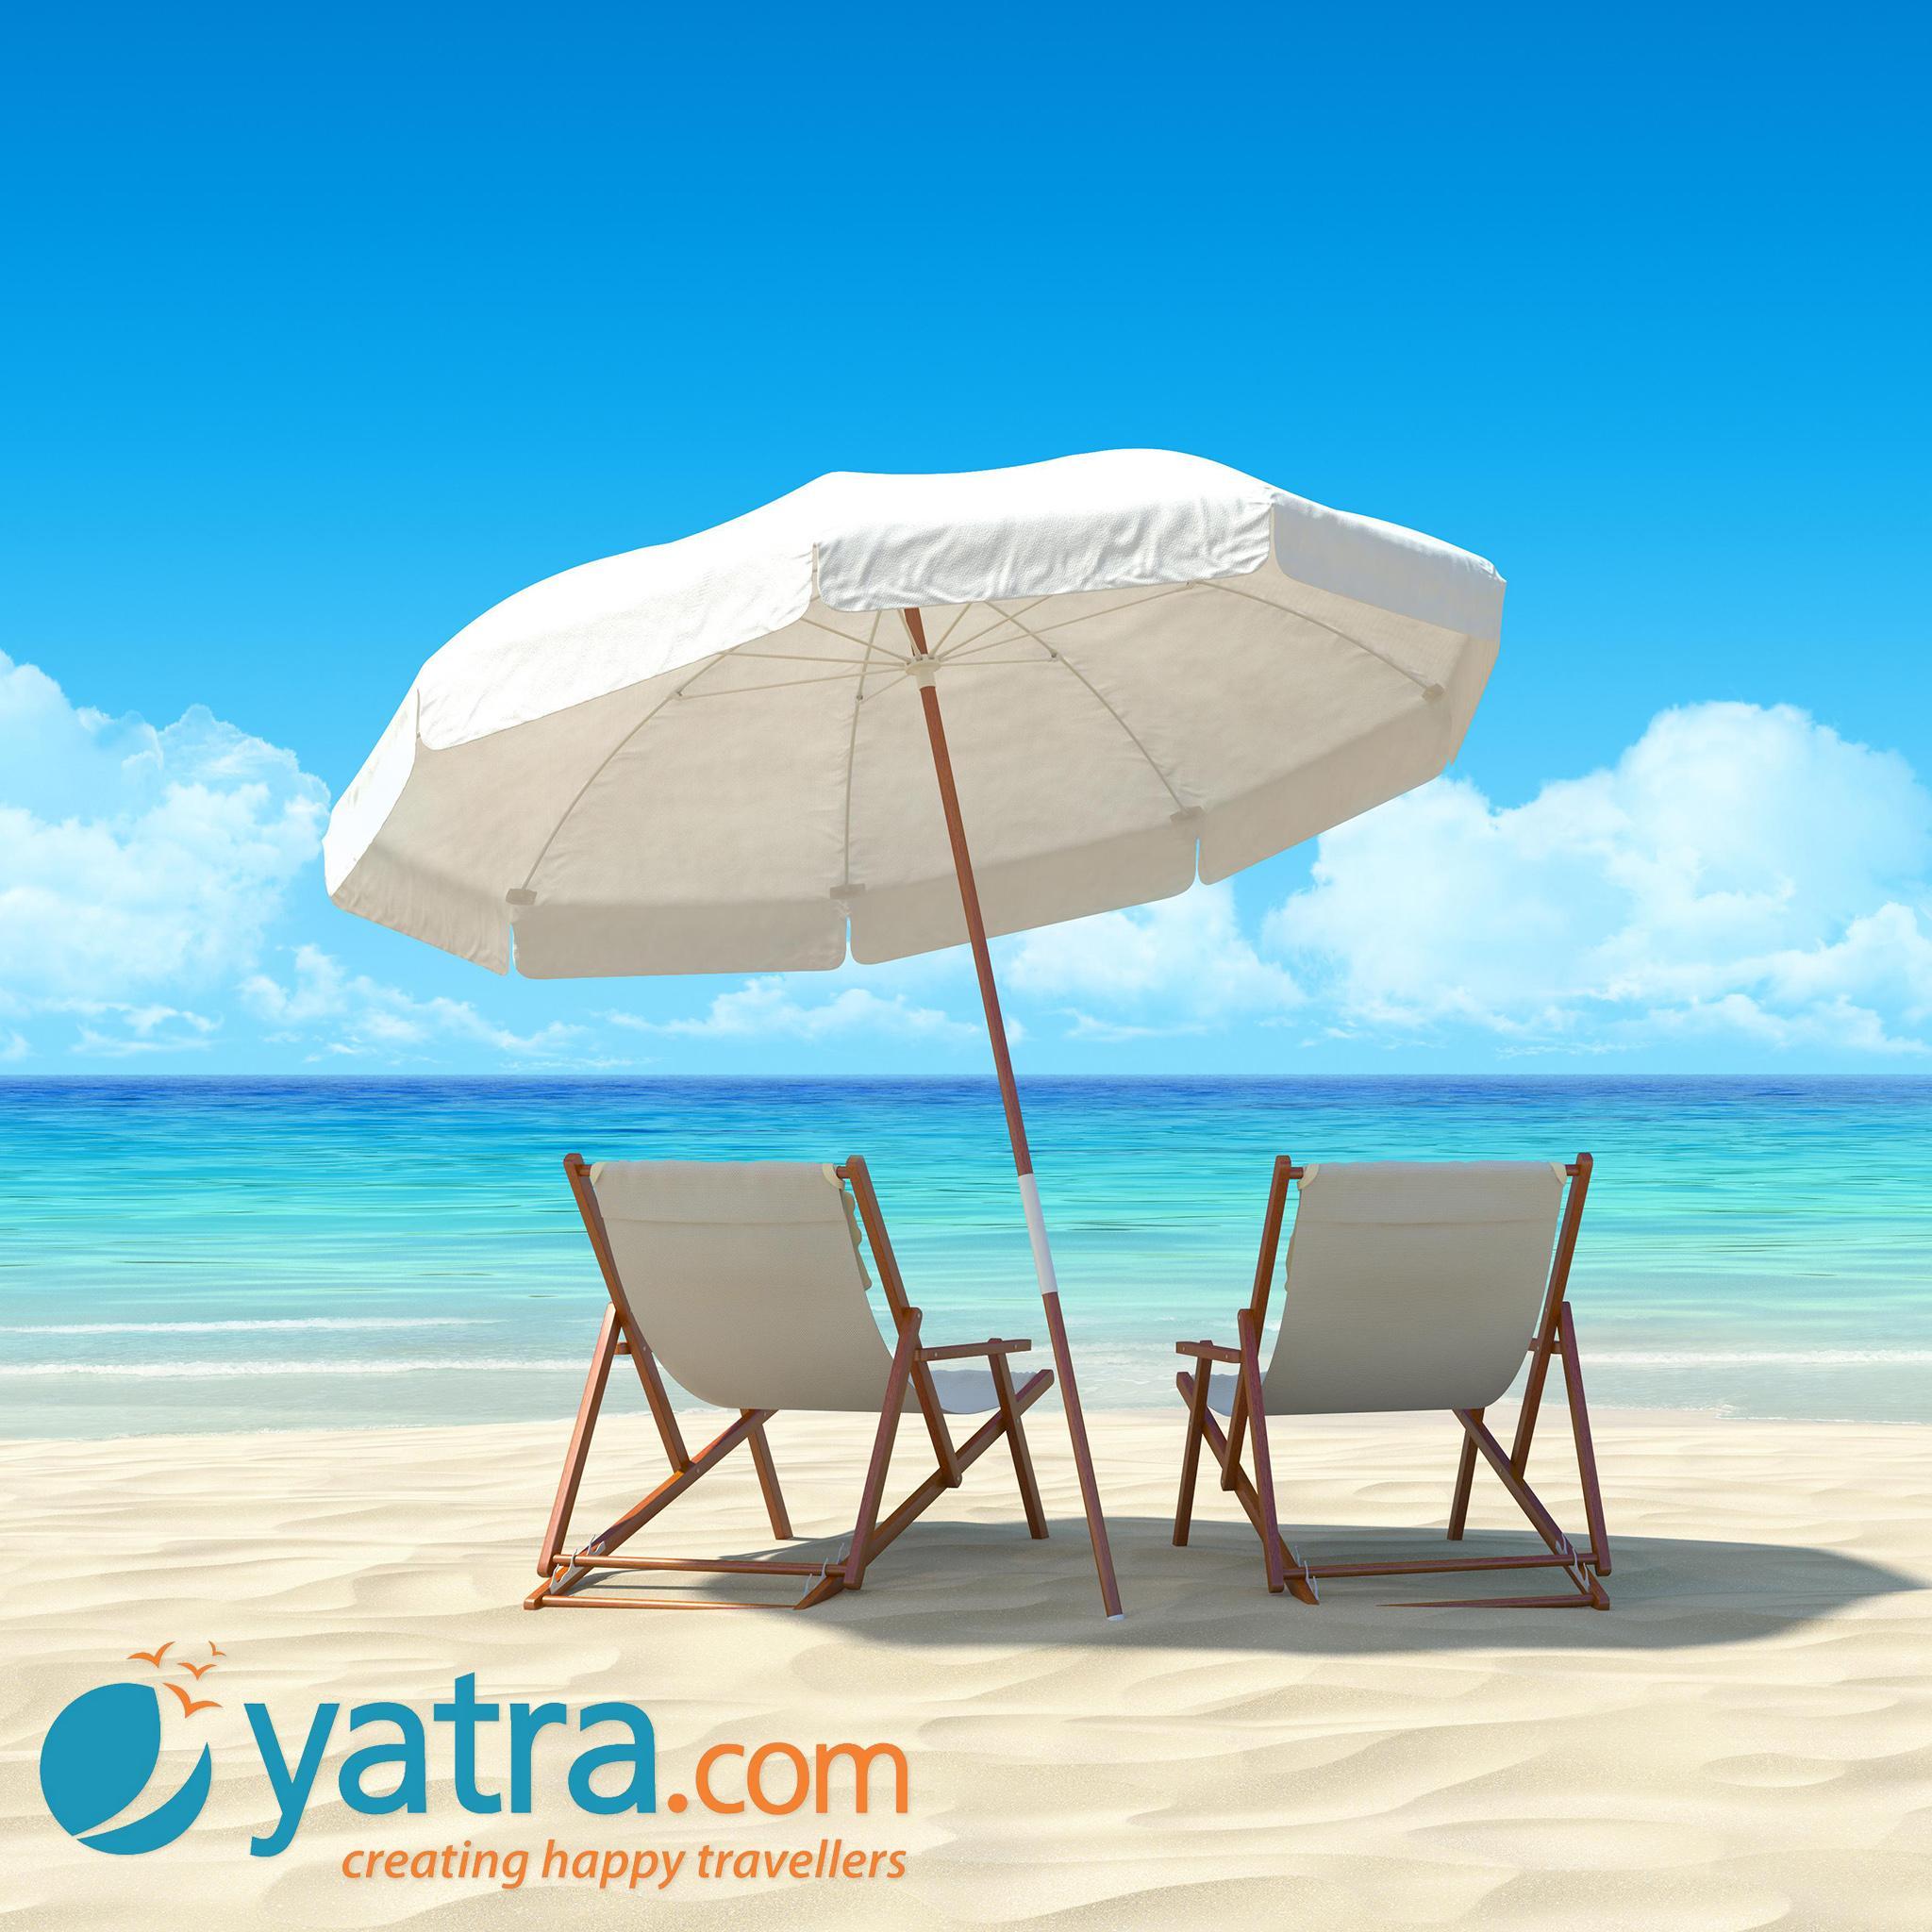 http://www.indiantelevision.com/sites/default/files/styles/smartcrop_800x800/public/images/tv-images/2016/08/12/Yatra%20dot%20com.jpg?itok=UK5FirBo